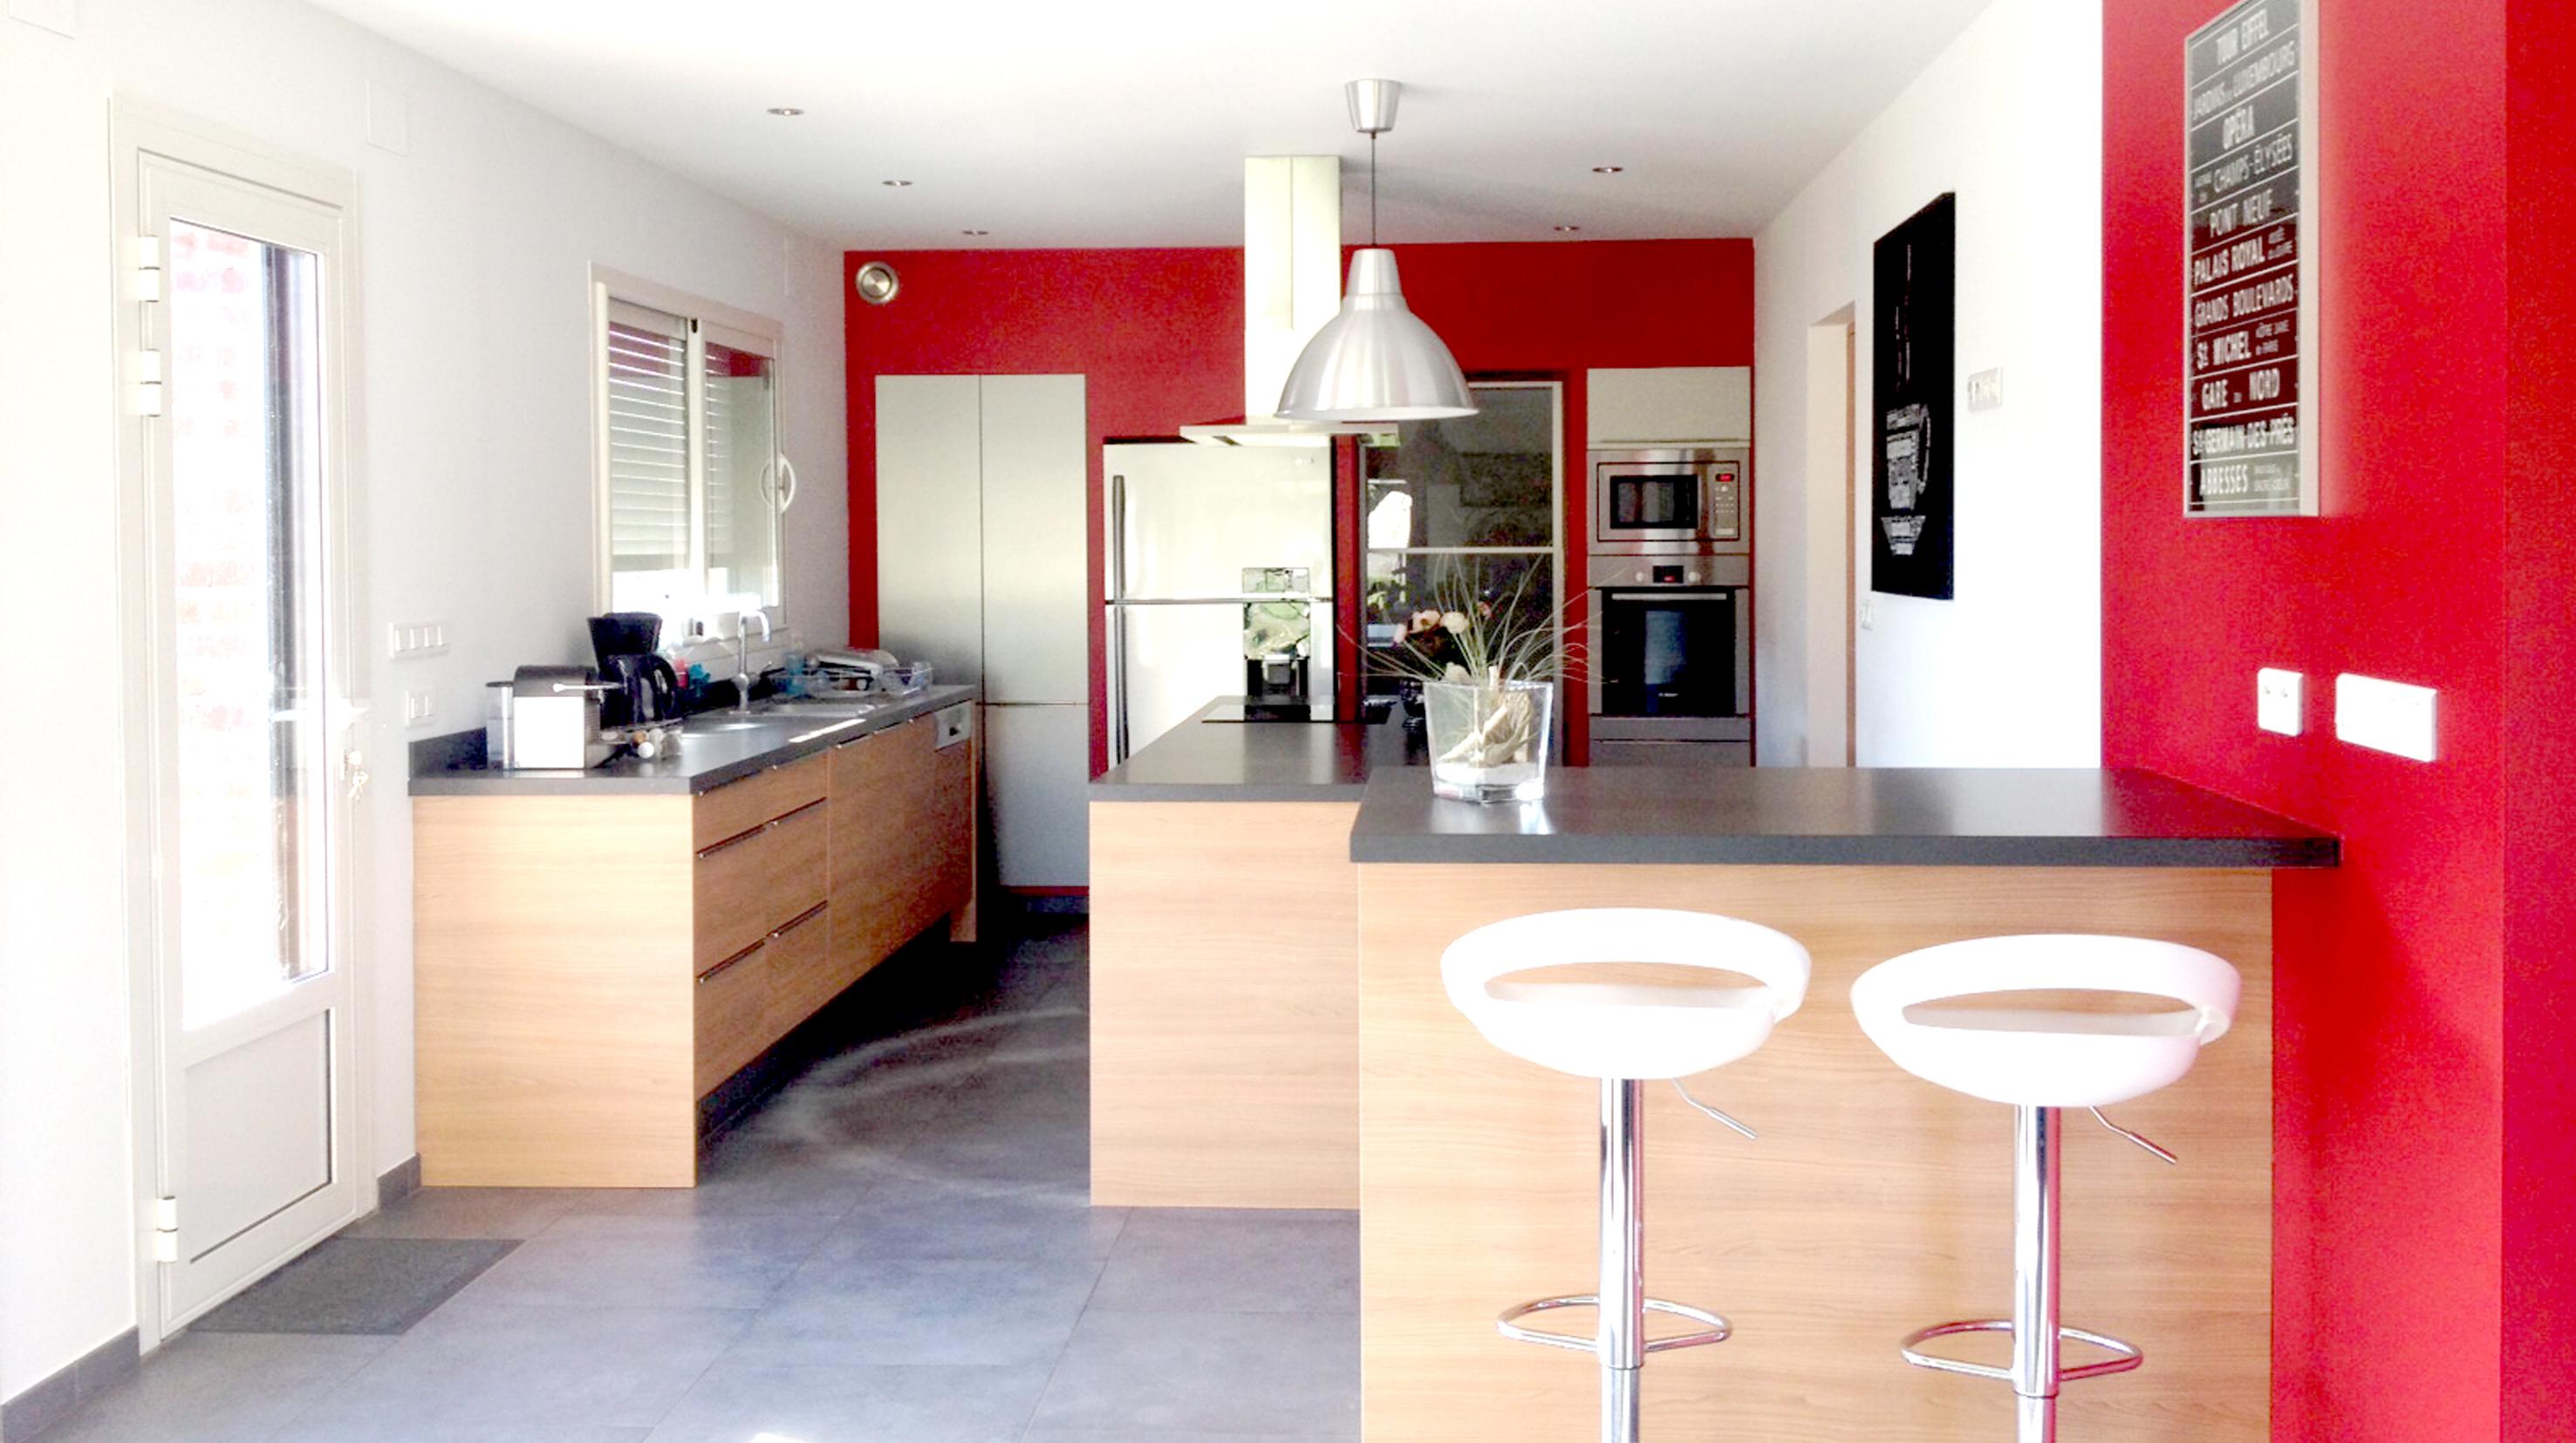 Cuisine moderne boddaert interieur architecte for Interieur cuisine moderne